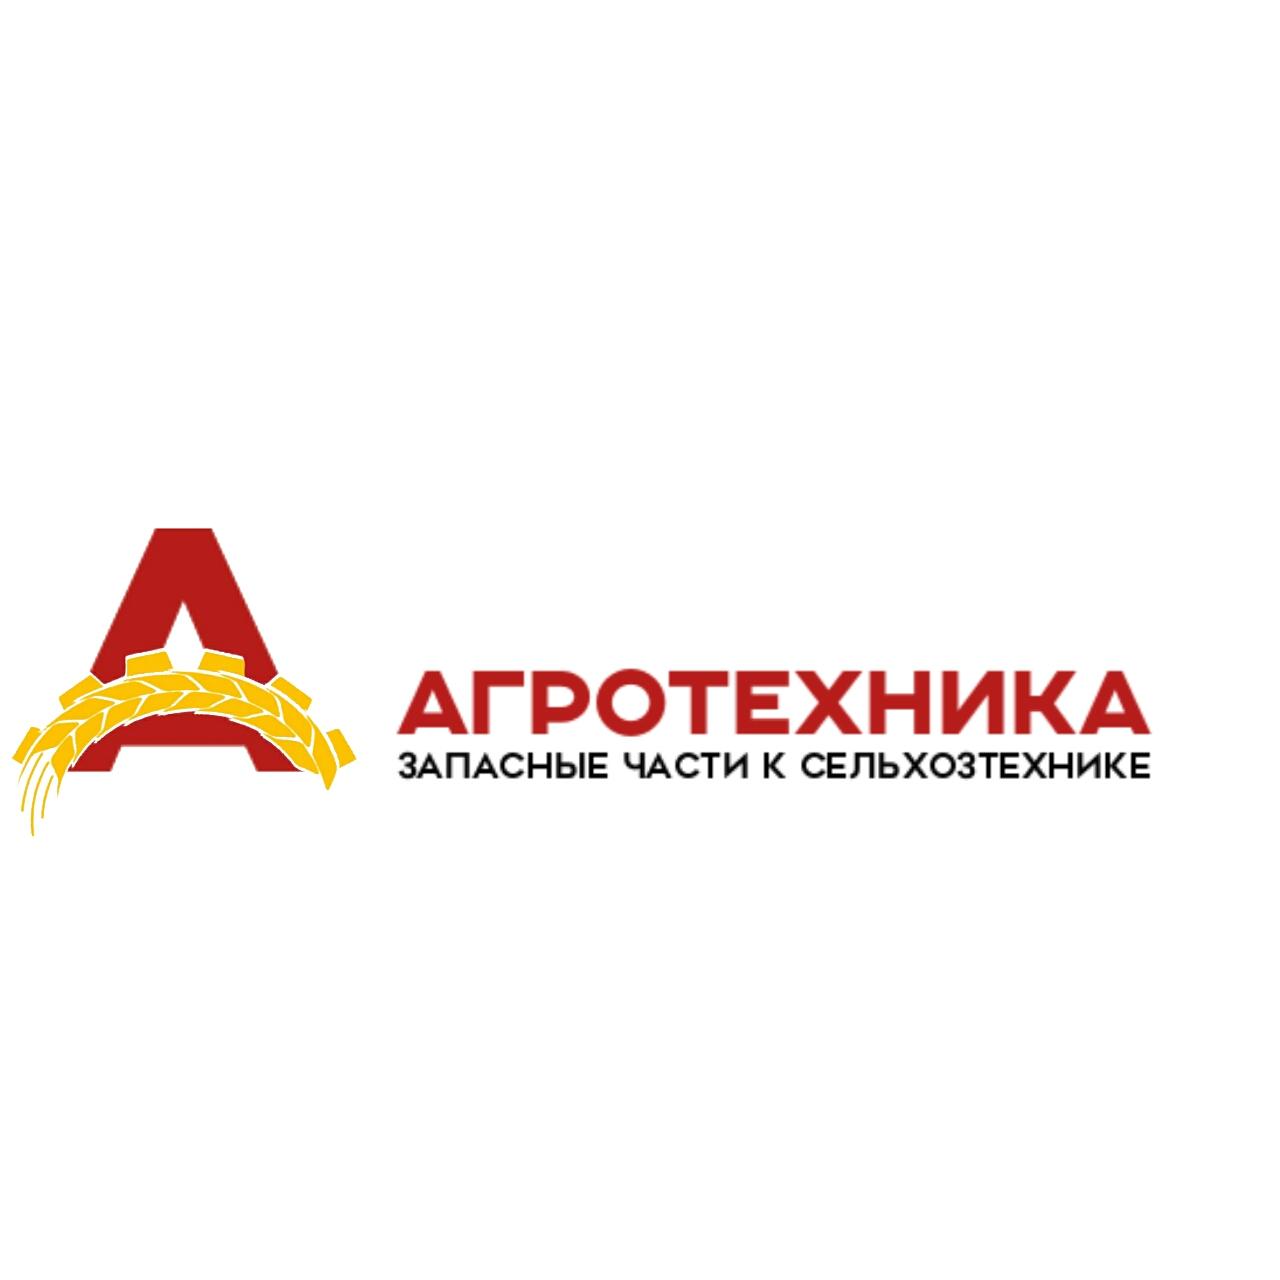 Разработка логотипа для компании Агротехника фото f_8195c002eeb30293.jpg